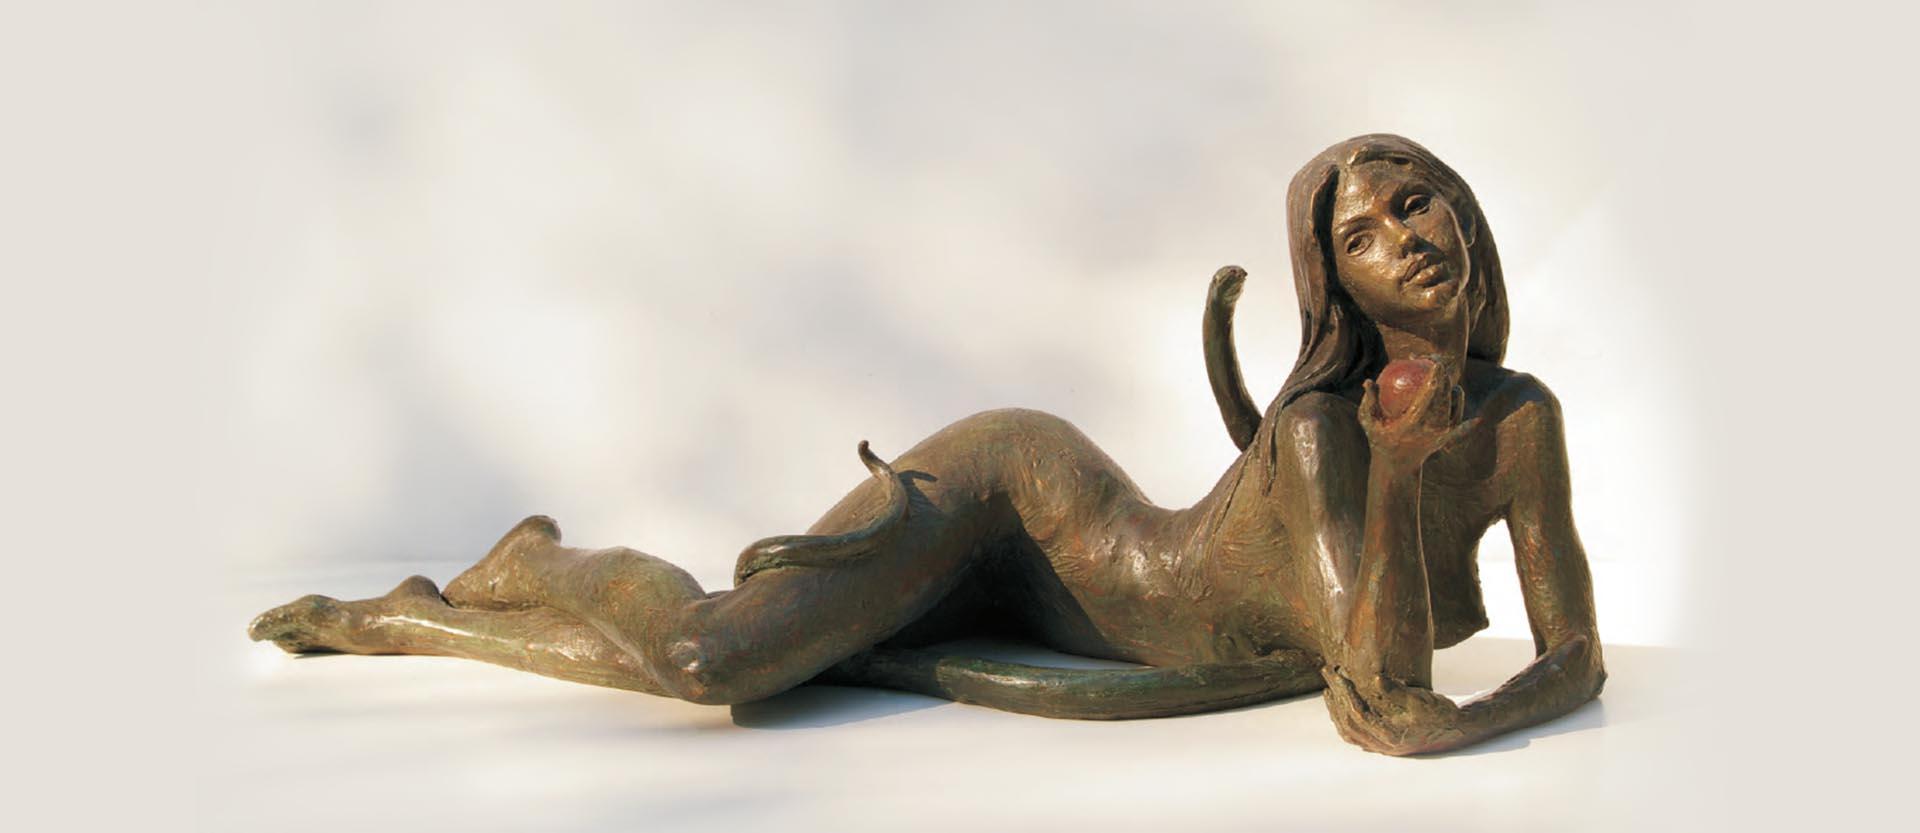 reviews-testimonials-opinions-evidence-customers-bronze-sculptures-statue-vittorio-tessaro-cover-01